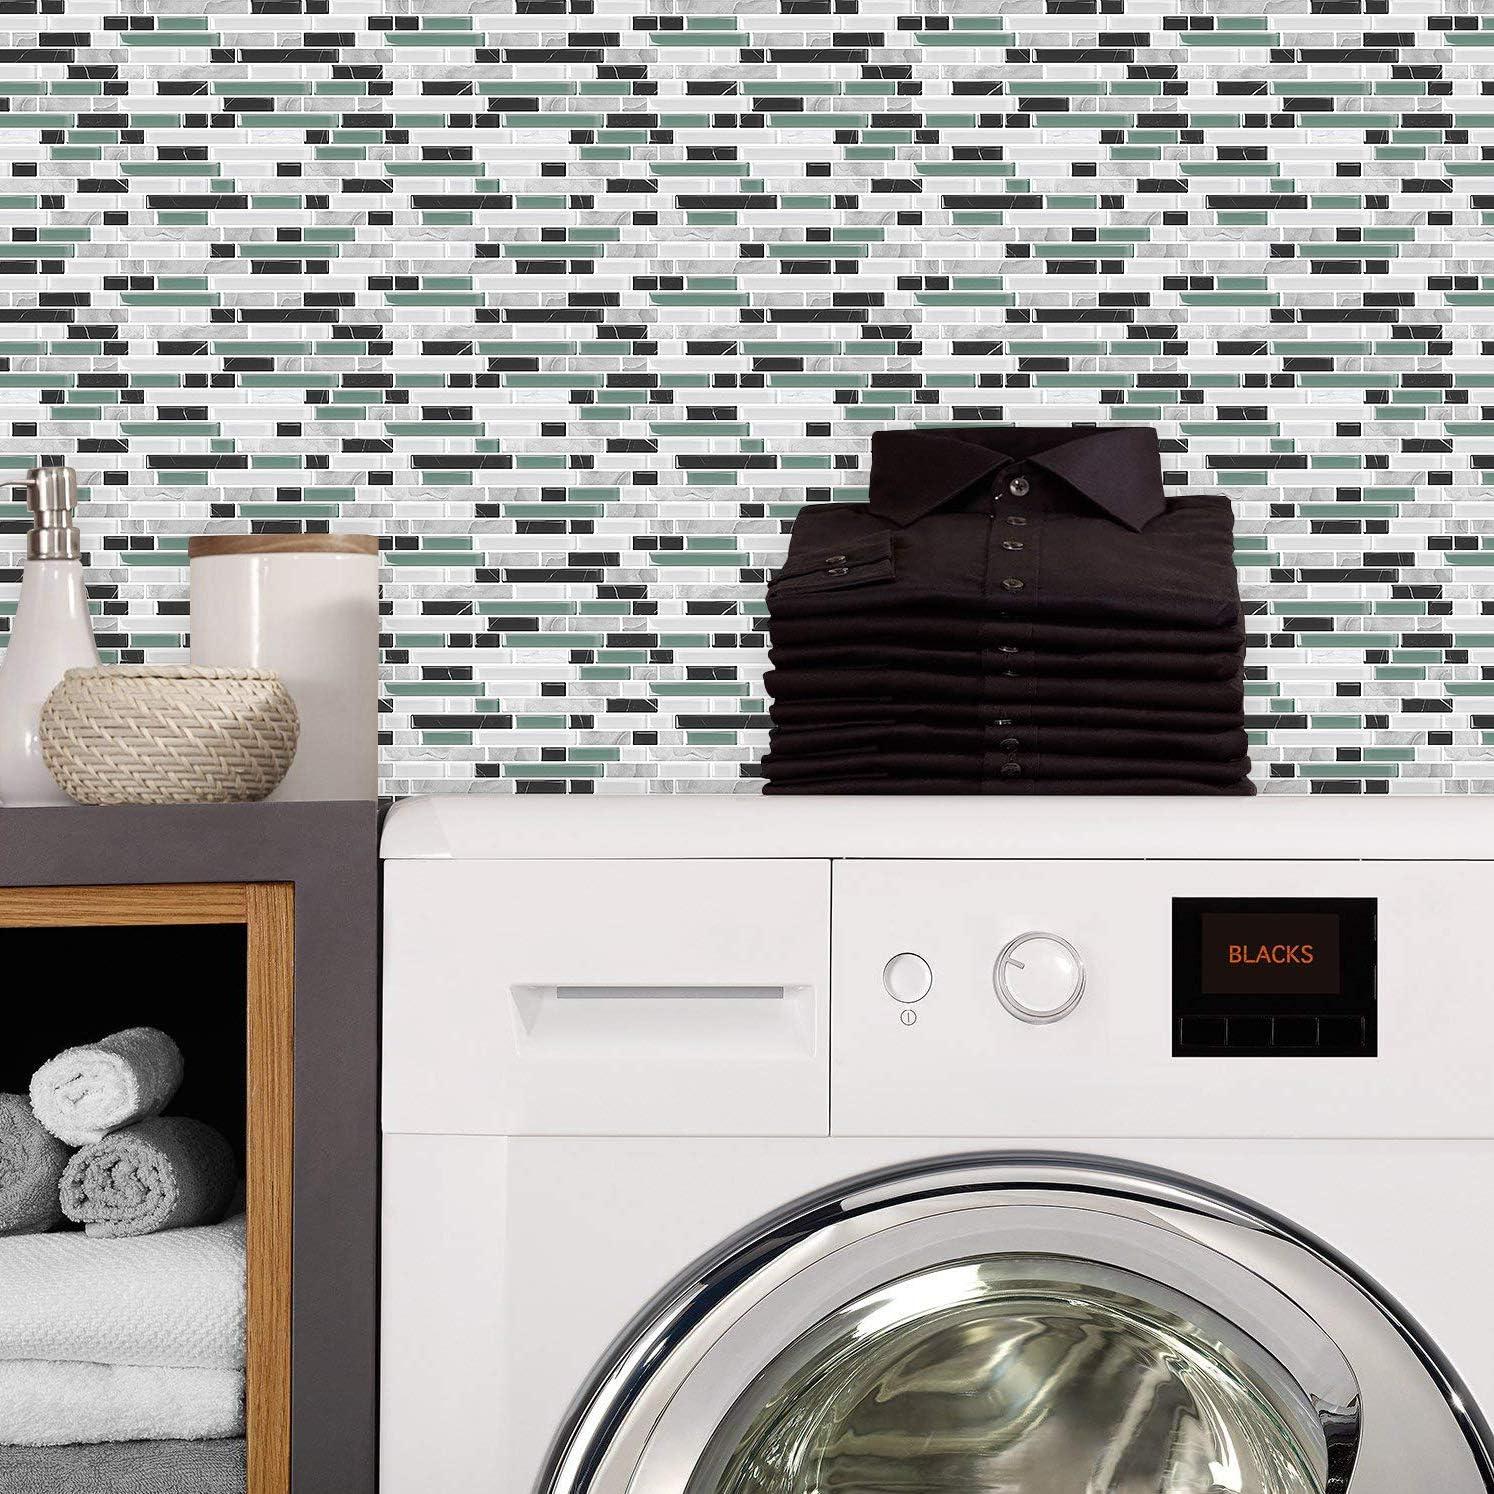 10 Sheets, 10X10 Peel and Stick Backsplash Self-Adhesive Backsplash Tile for Kitchen in Seagreen